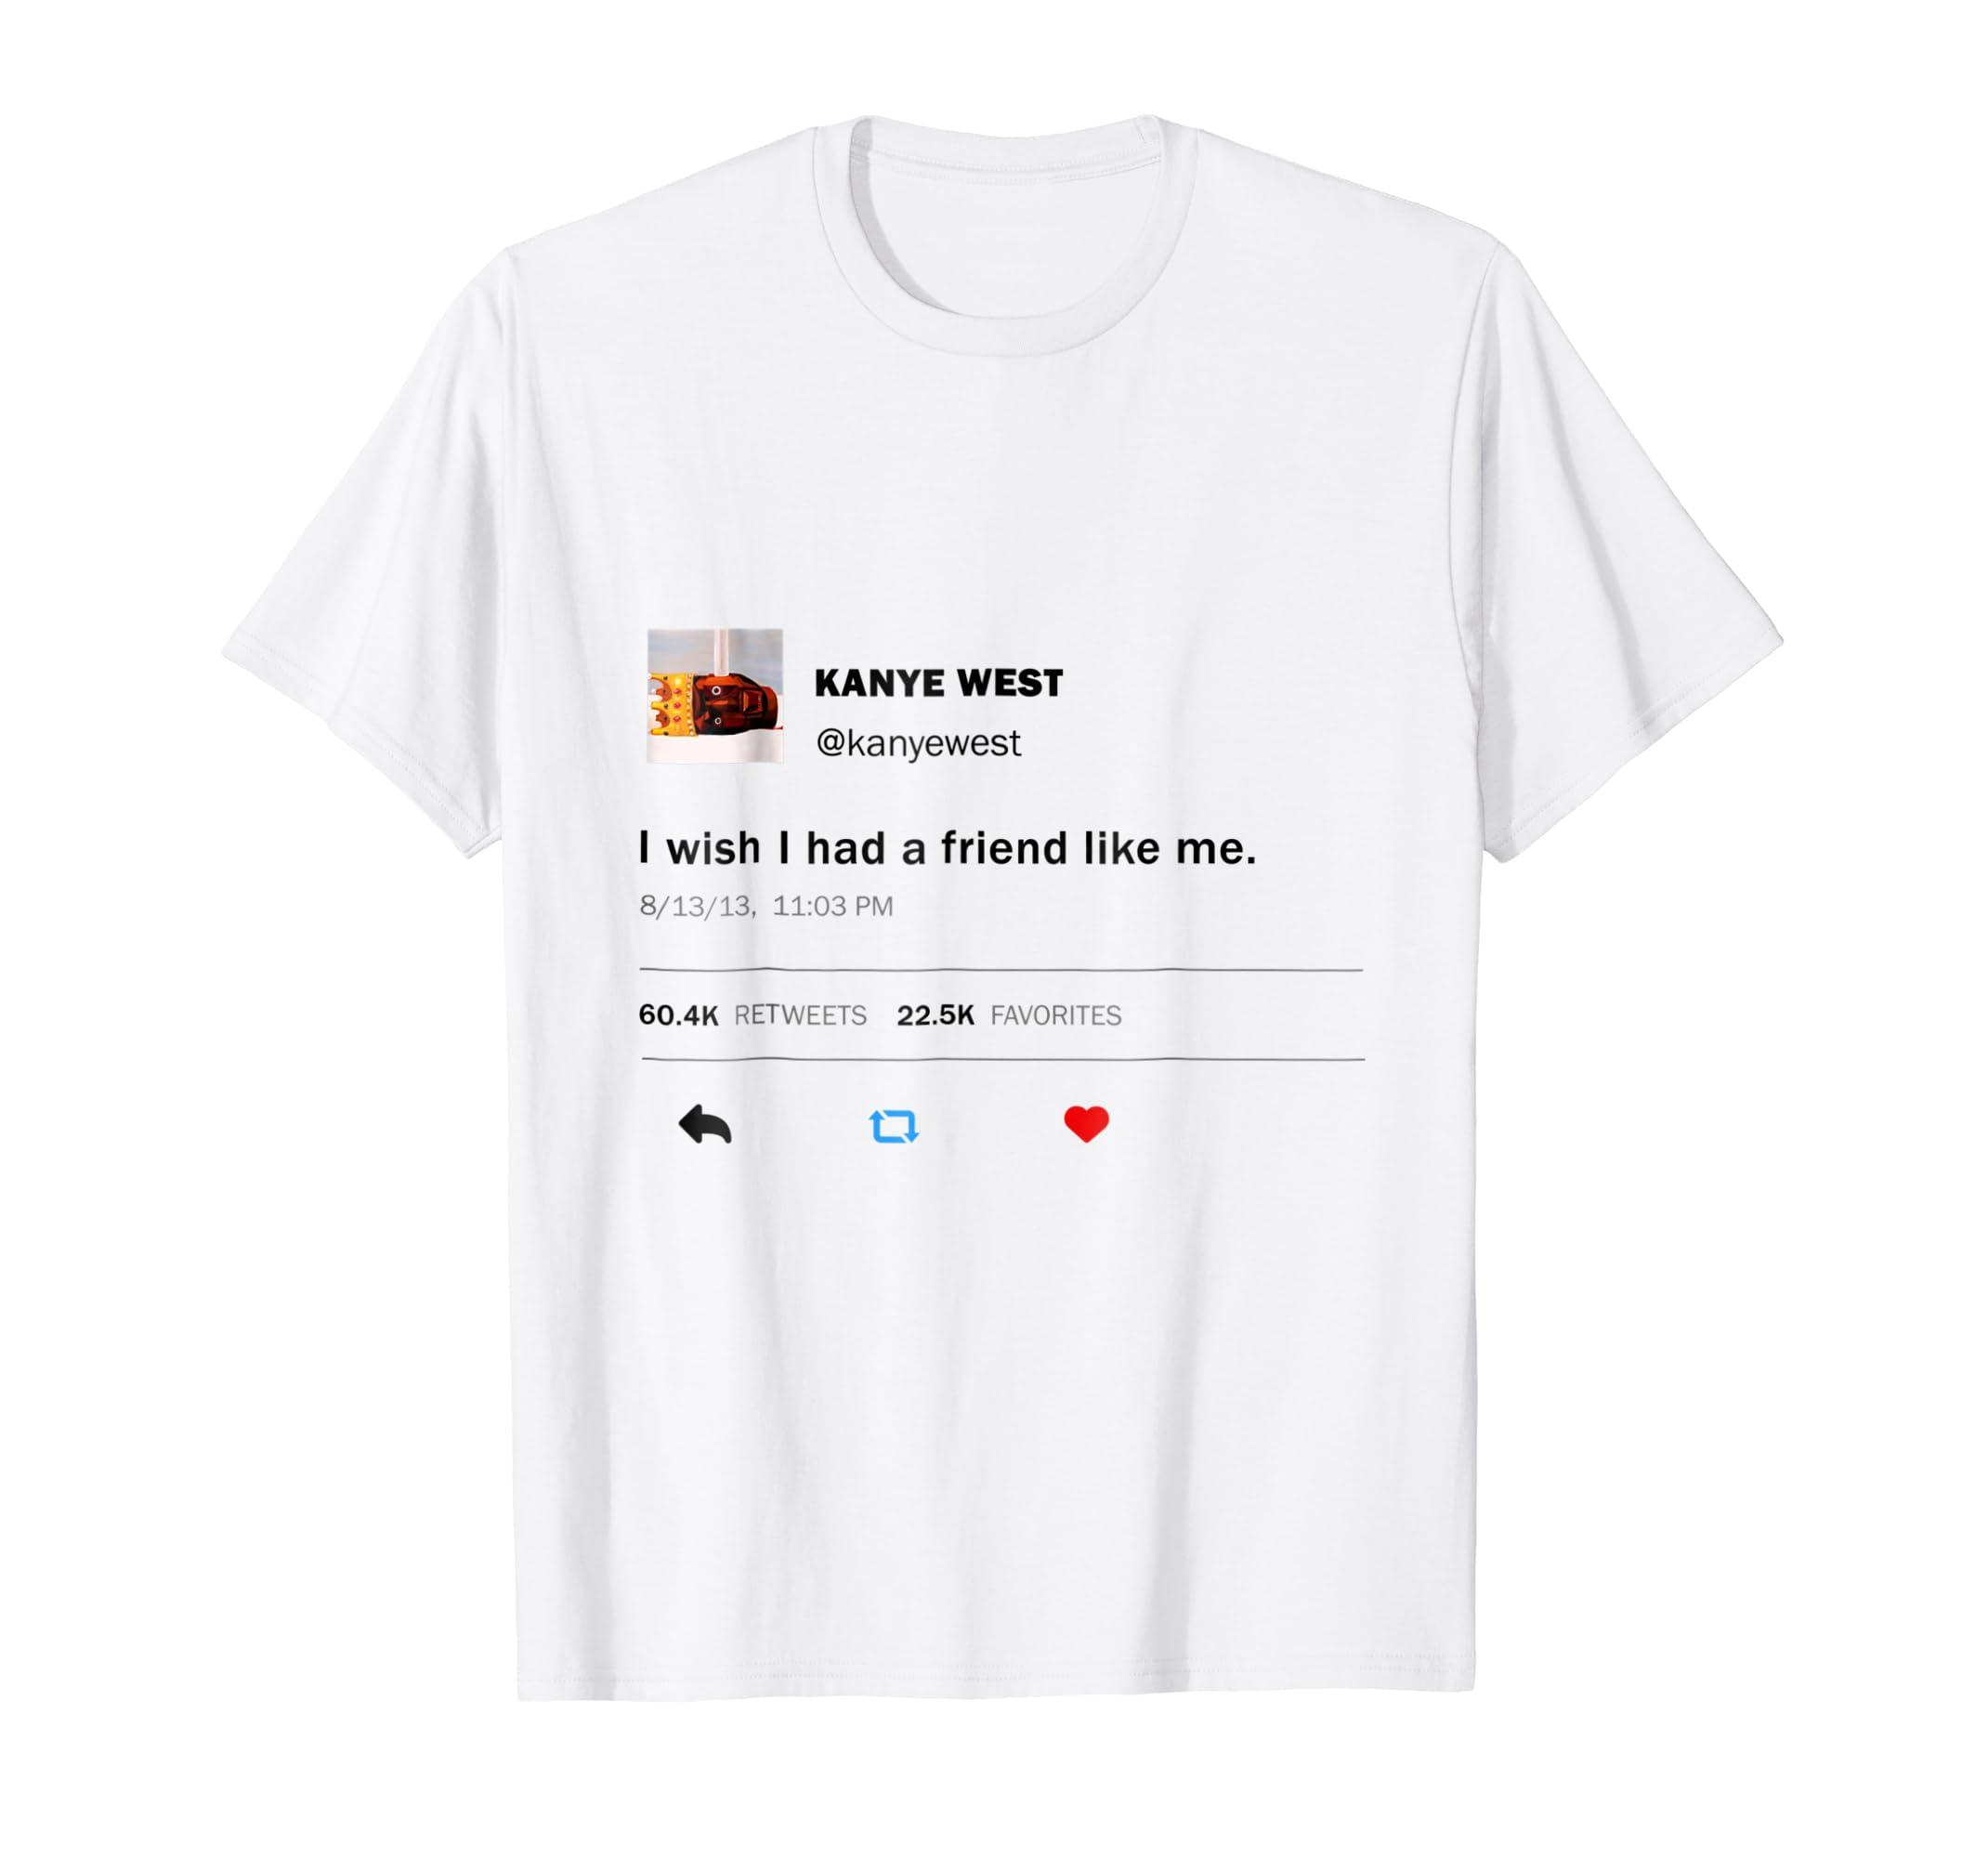 33ca50afc Amazon.com: I wish I had a friend like me t-shirt from a tweet: Clothing